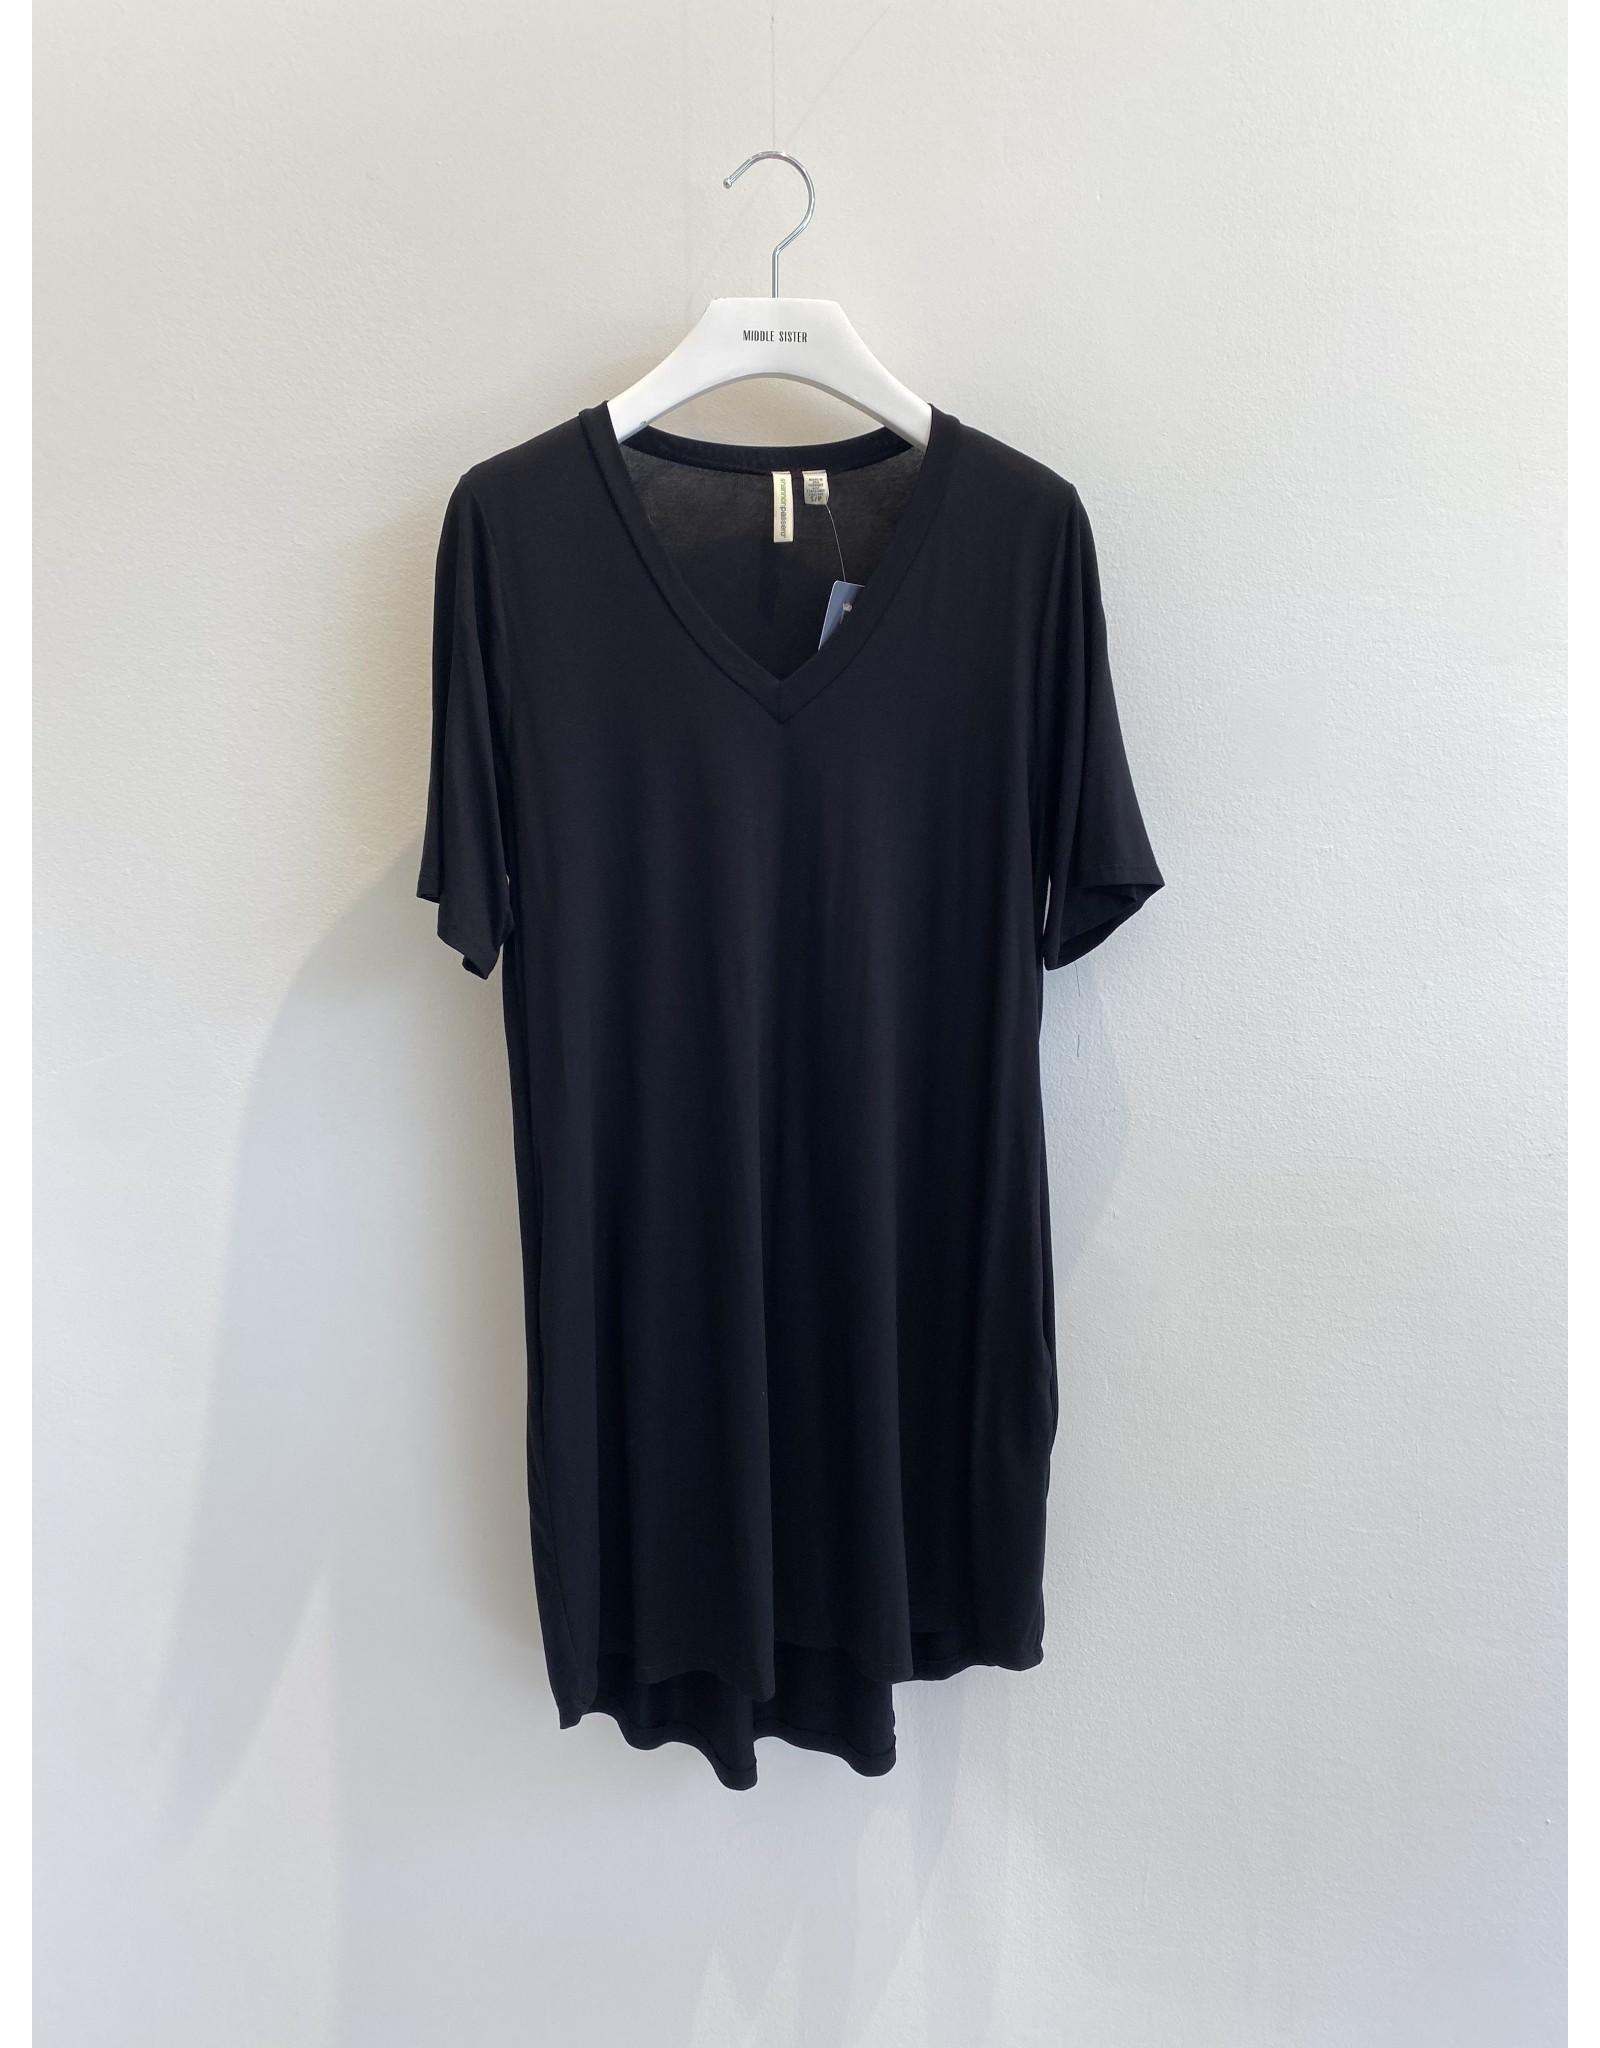 Shannon Passero Linda Vneck Dress Black